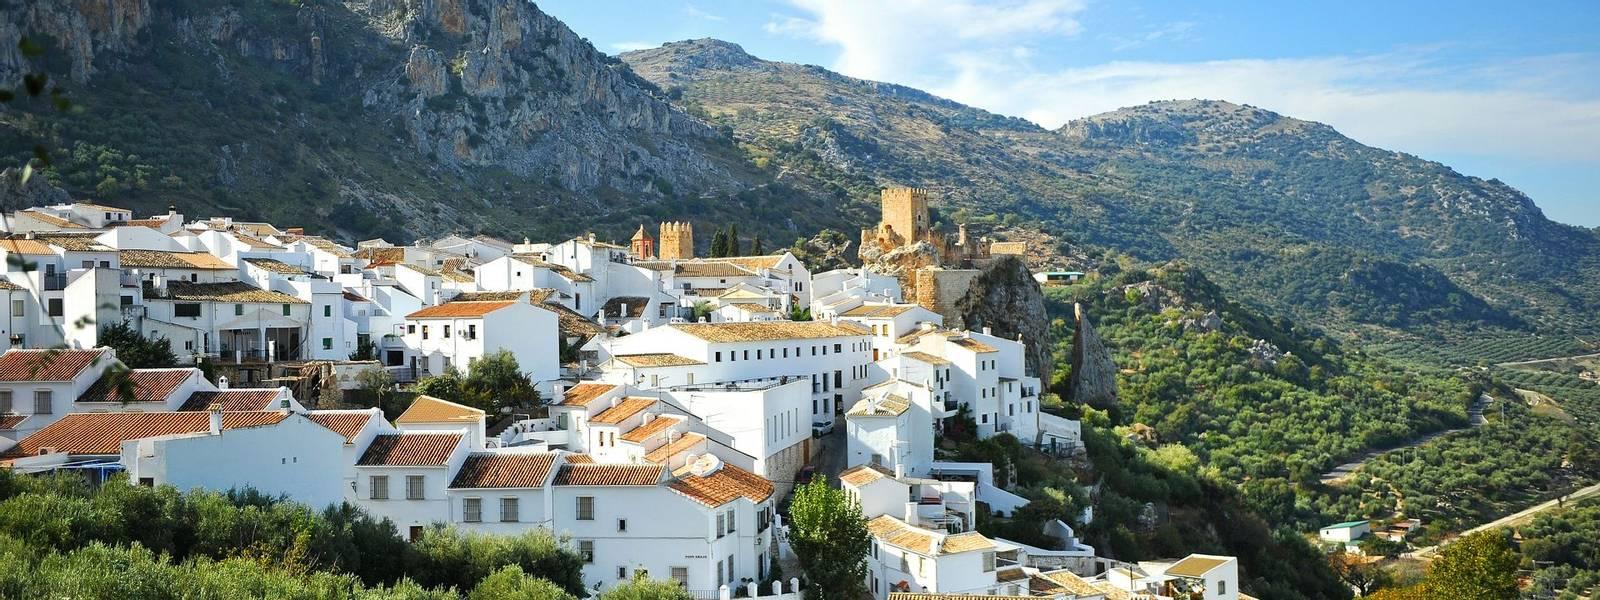 Spain - Andalucia - Cordoba - AdobeStock_72936596.jpeg